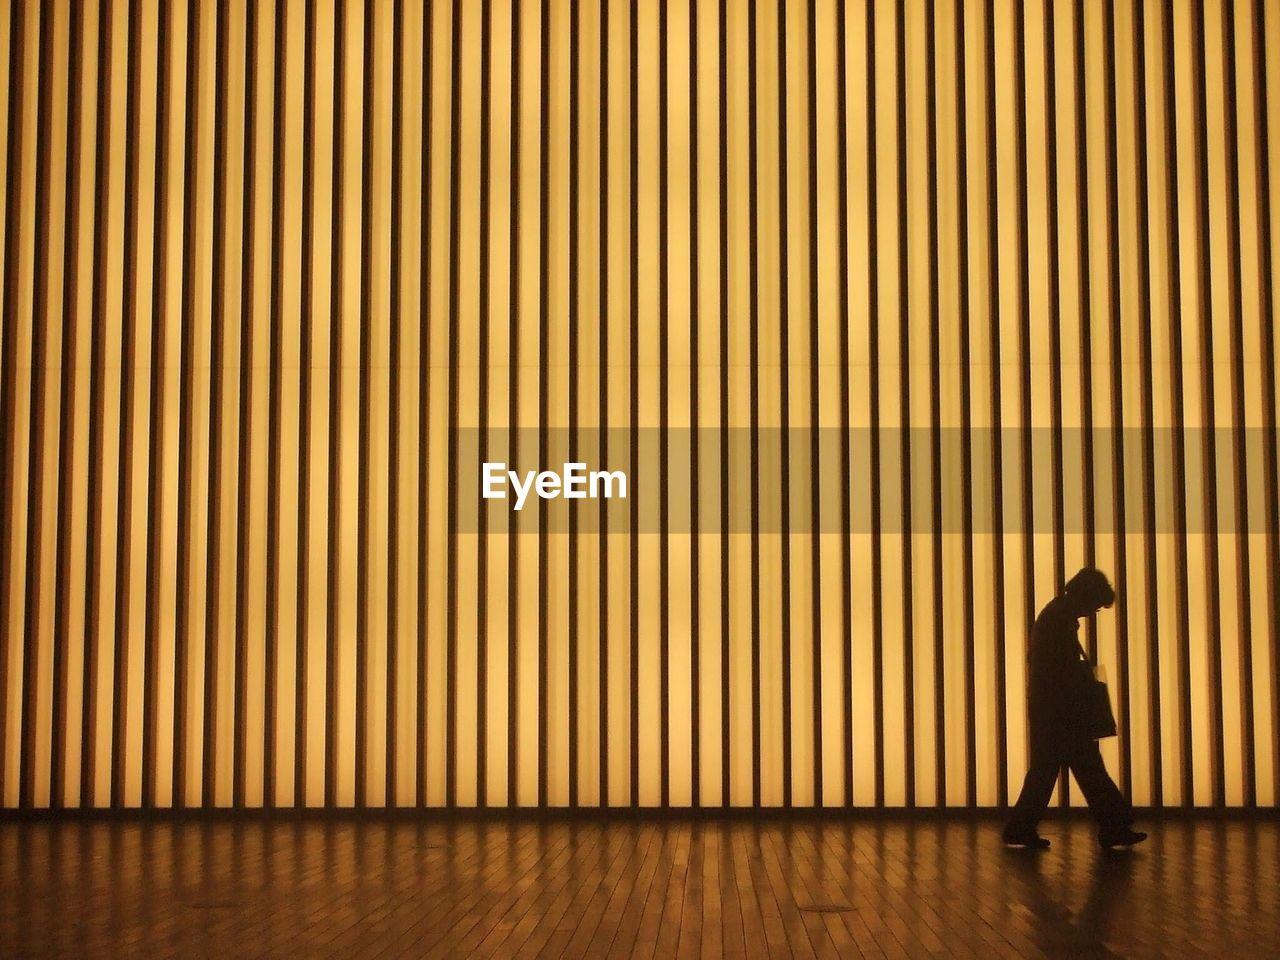 Silhouette man walking against illuminated pattern wall at night